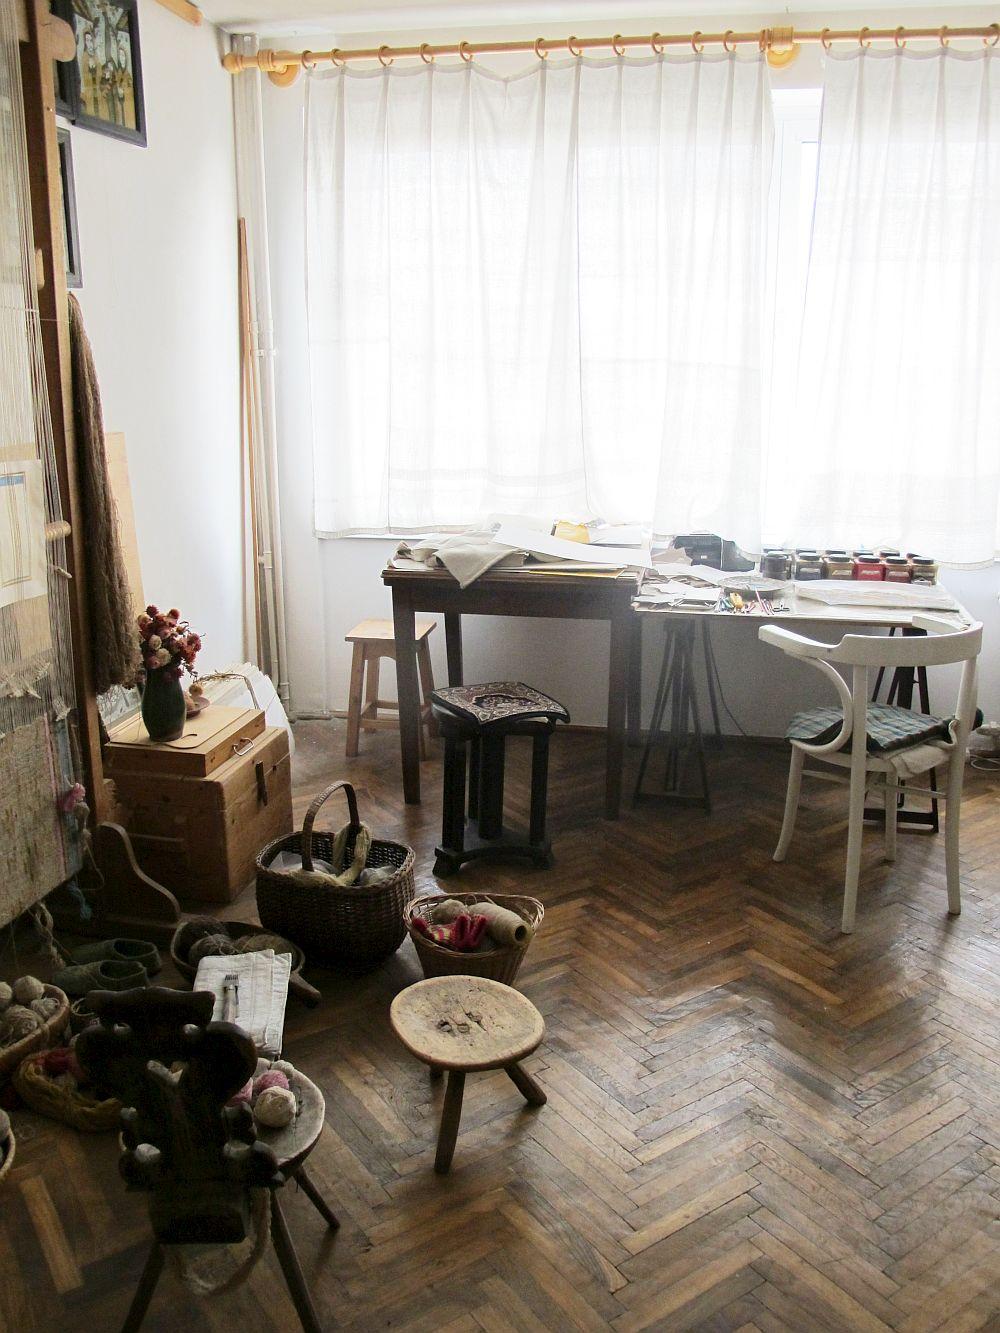 adelaparvu.com despre acuarele Mihai Macri, atelier artist Mihai si Mariana Macri (54)